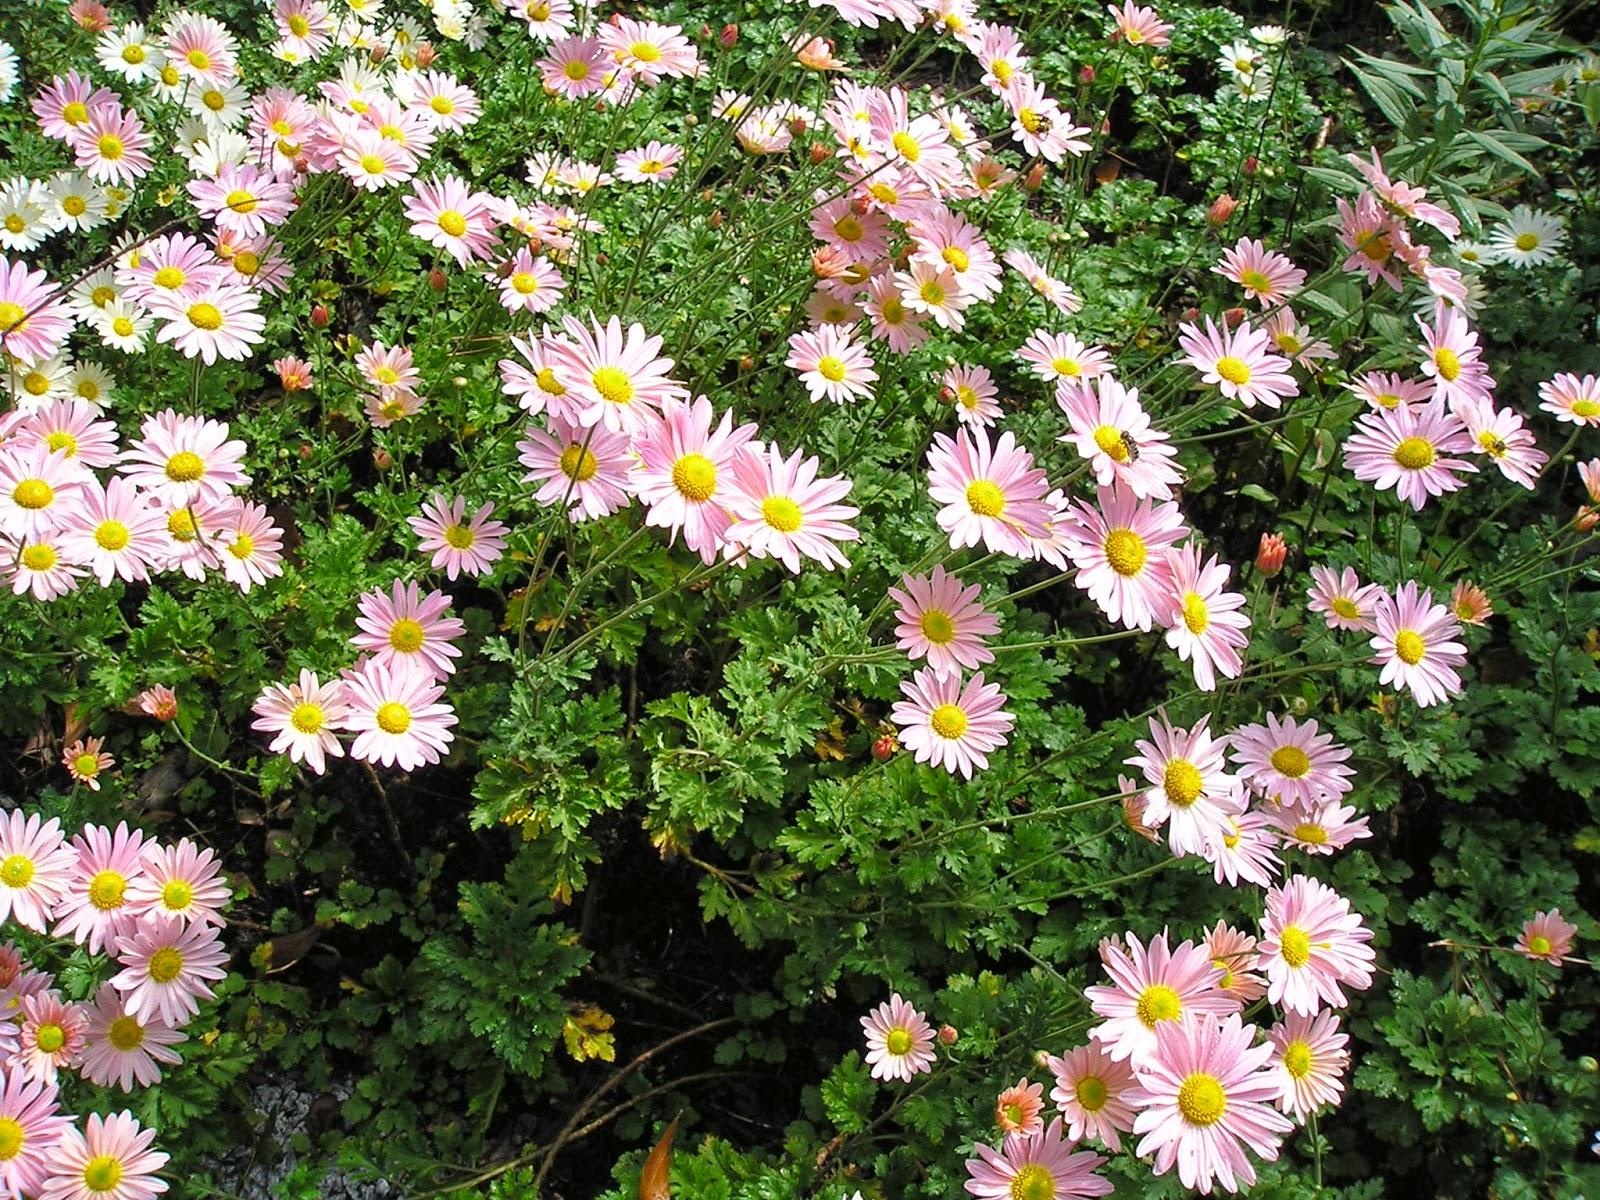 Carol S Garden: Carol's Greenville NC Garden: Chrysanthemum Rubellum